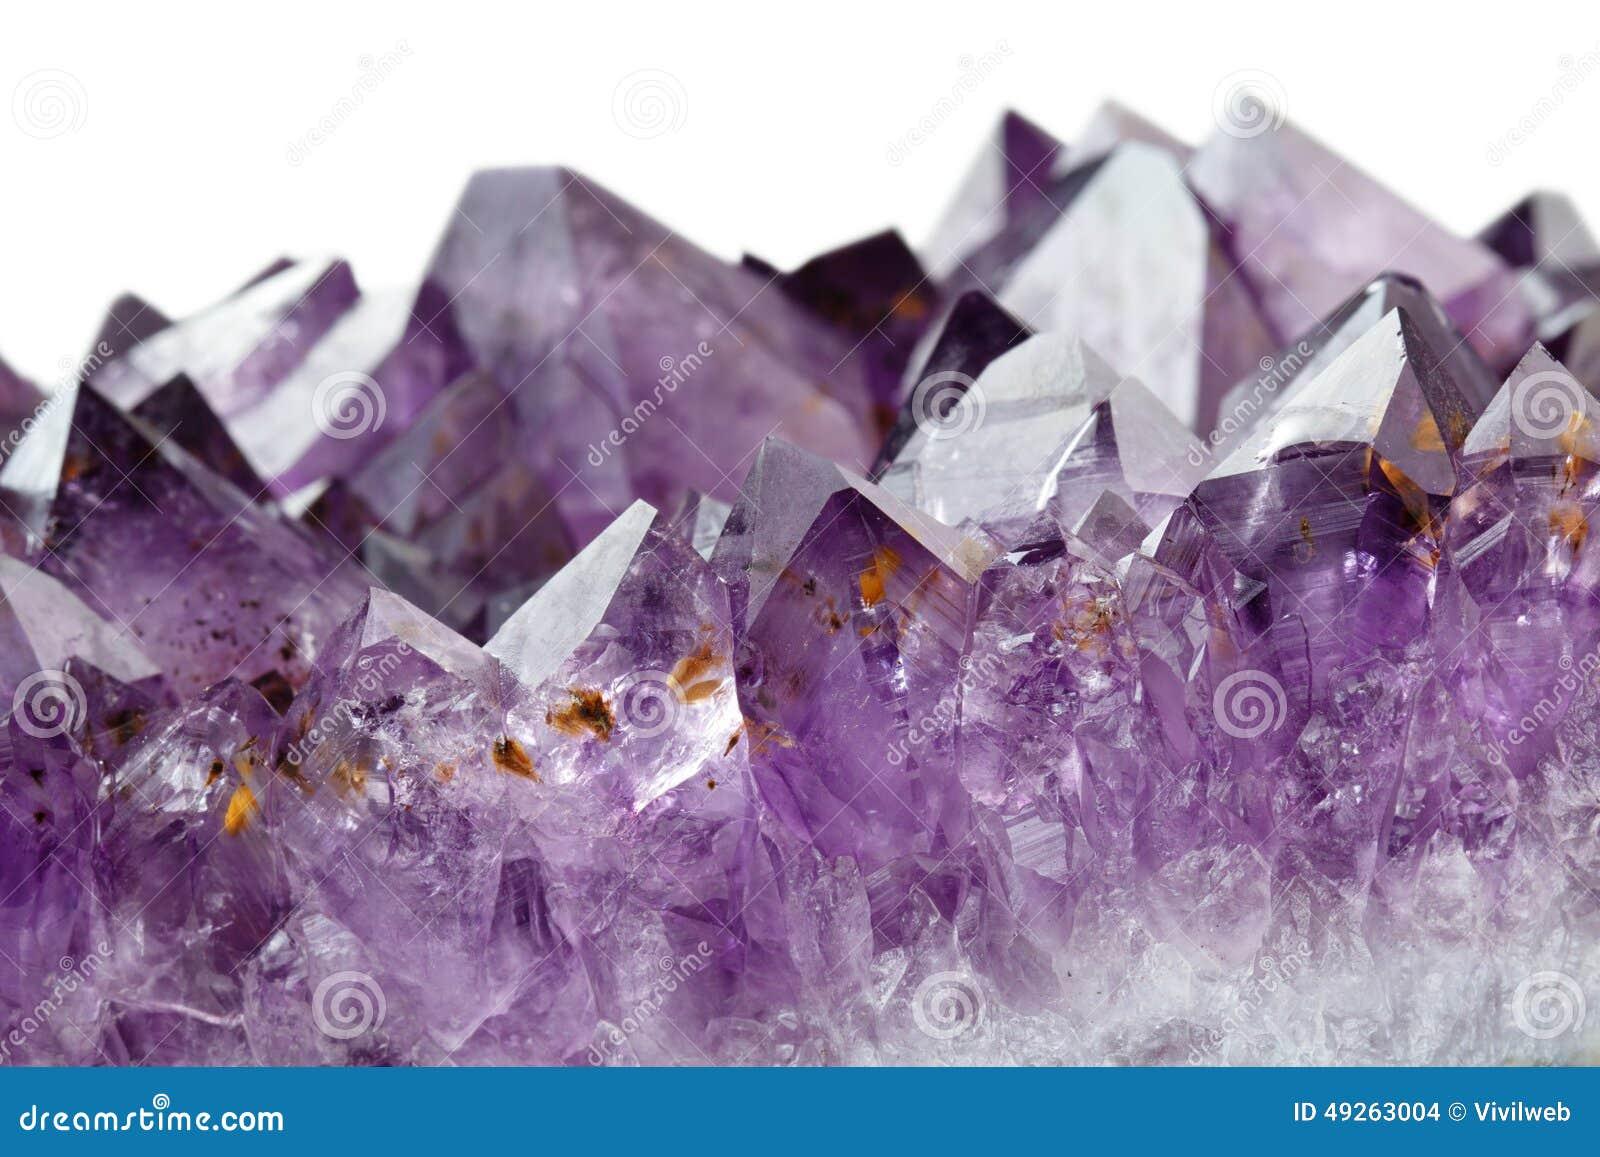 Violetkleurige Kristallen